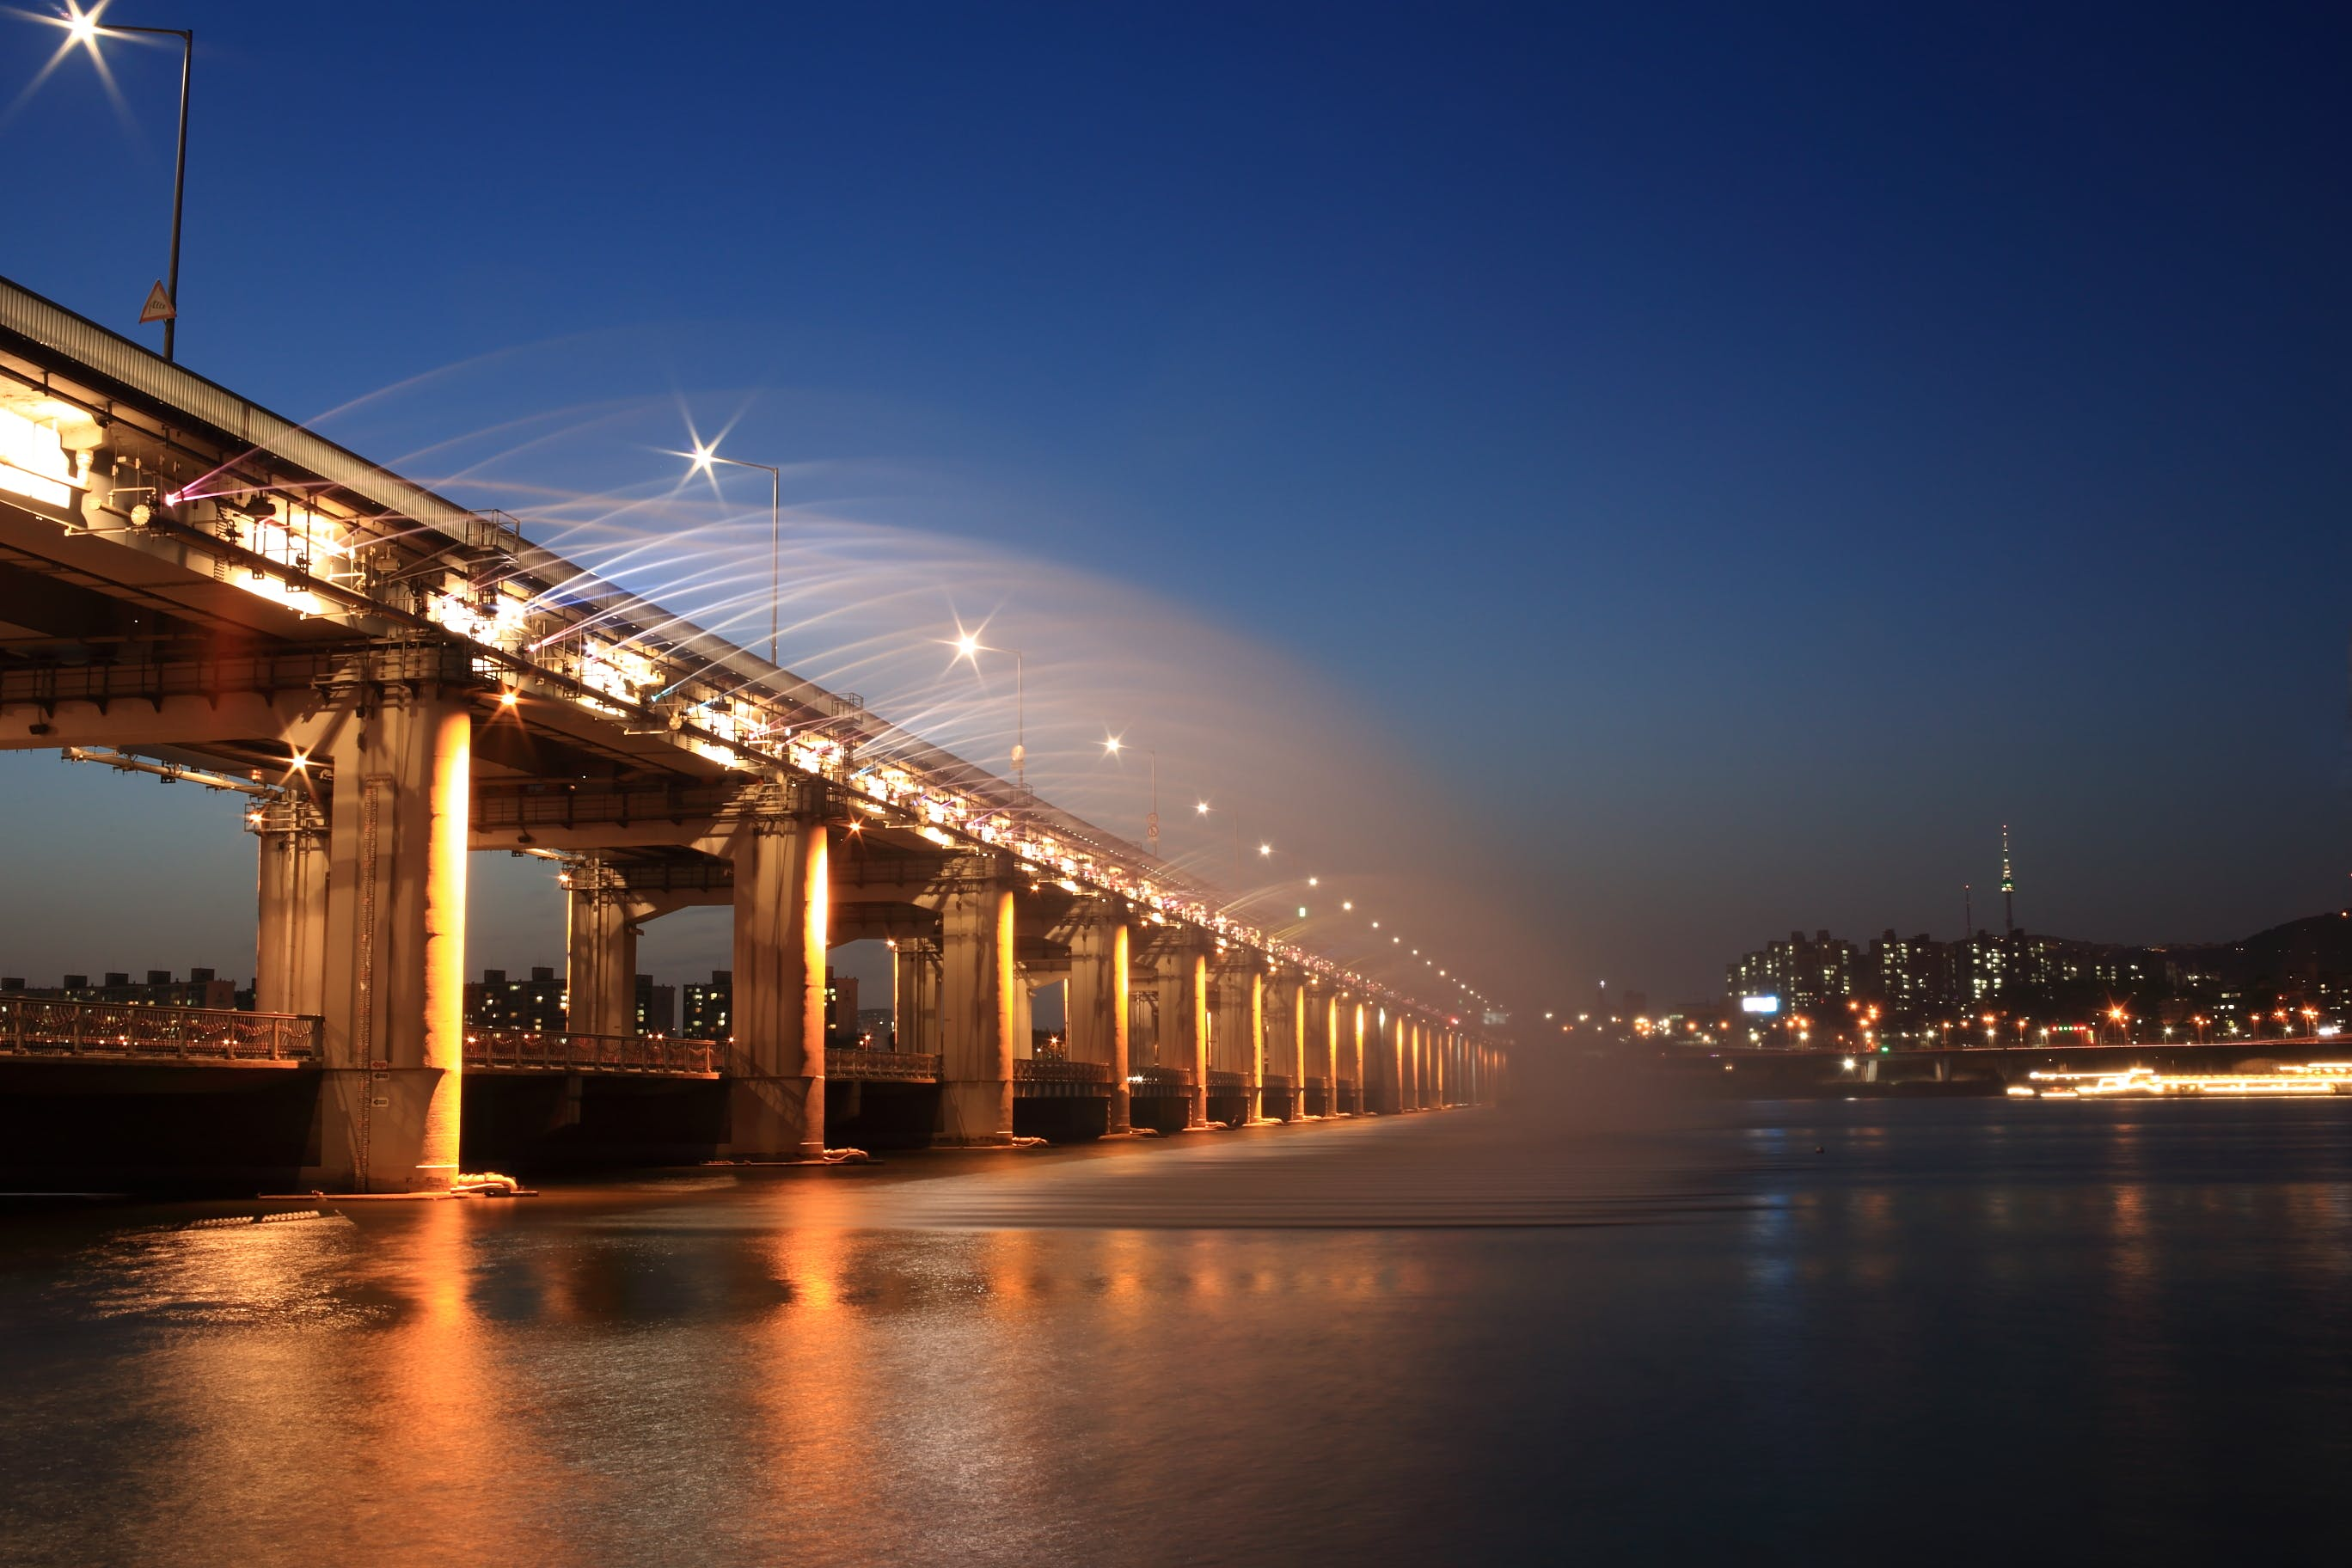 architecture, bridge, city